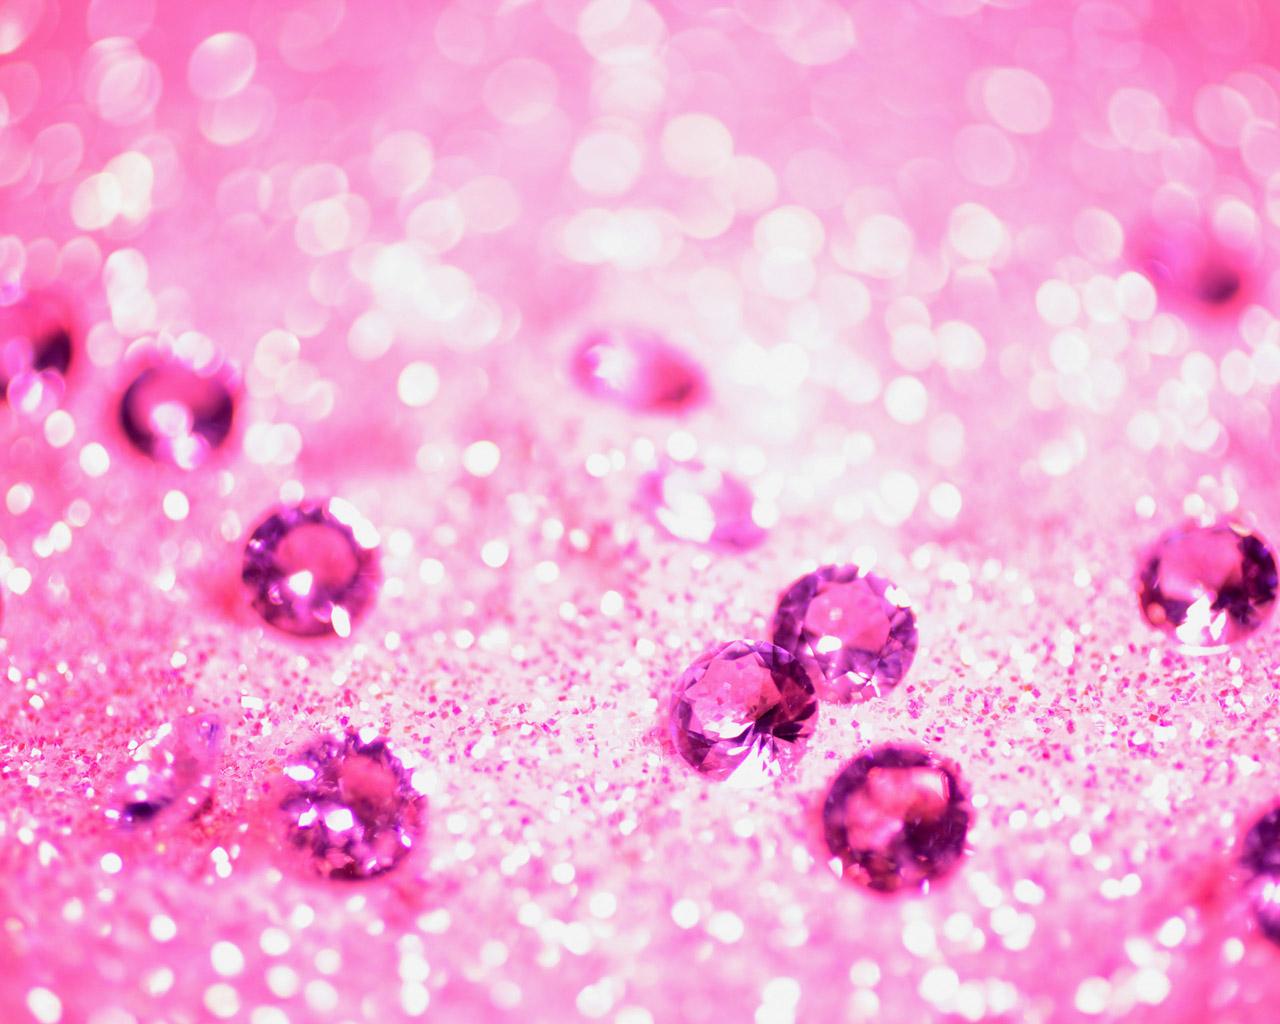 Pink Diamond Desktop Wallpaper on this Pink Wallpaper Backgrounds 1280x1024